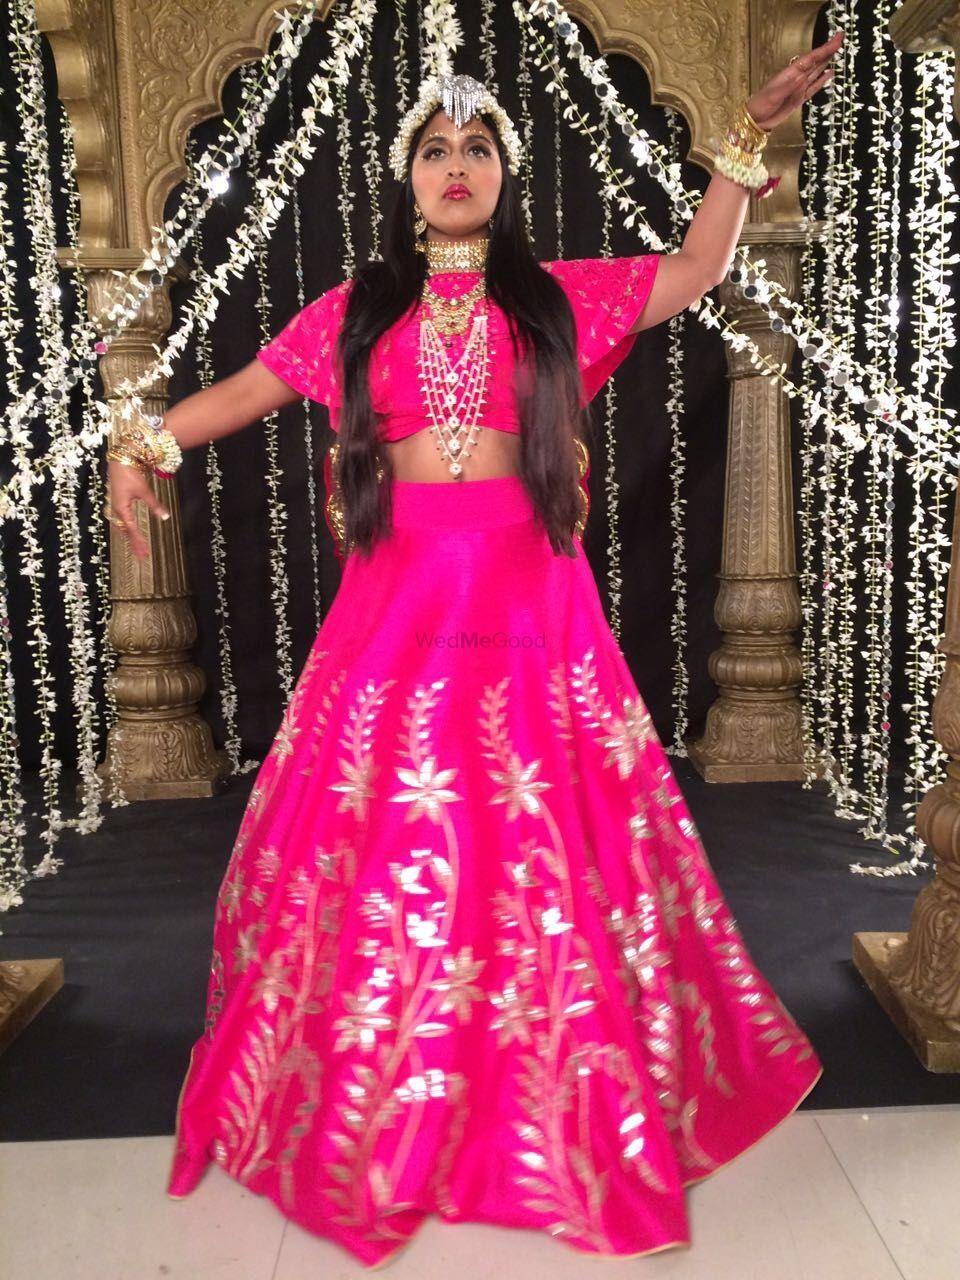 Photo From Celebrity Spotting  - By Sweta Parikh-Bespoke Jewelry